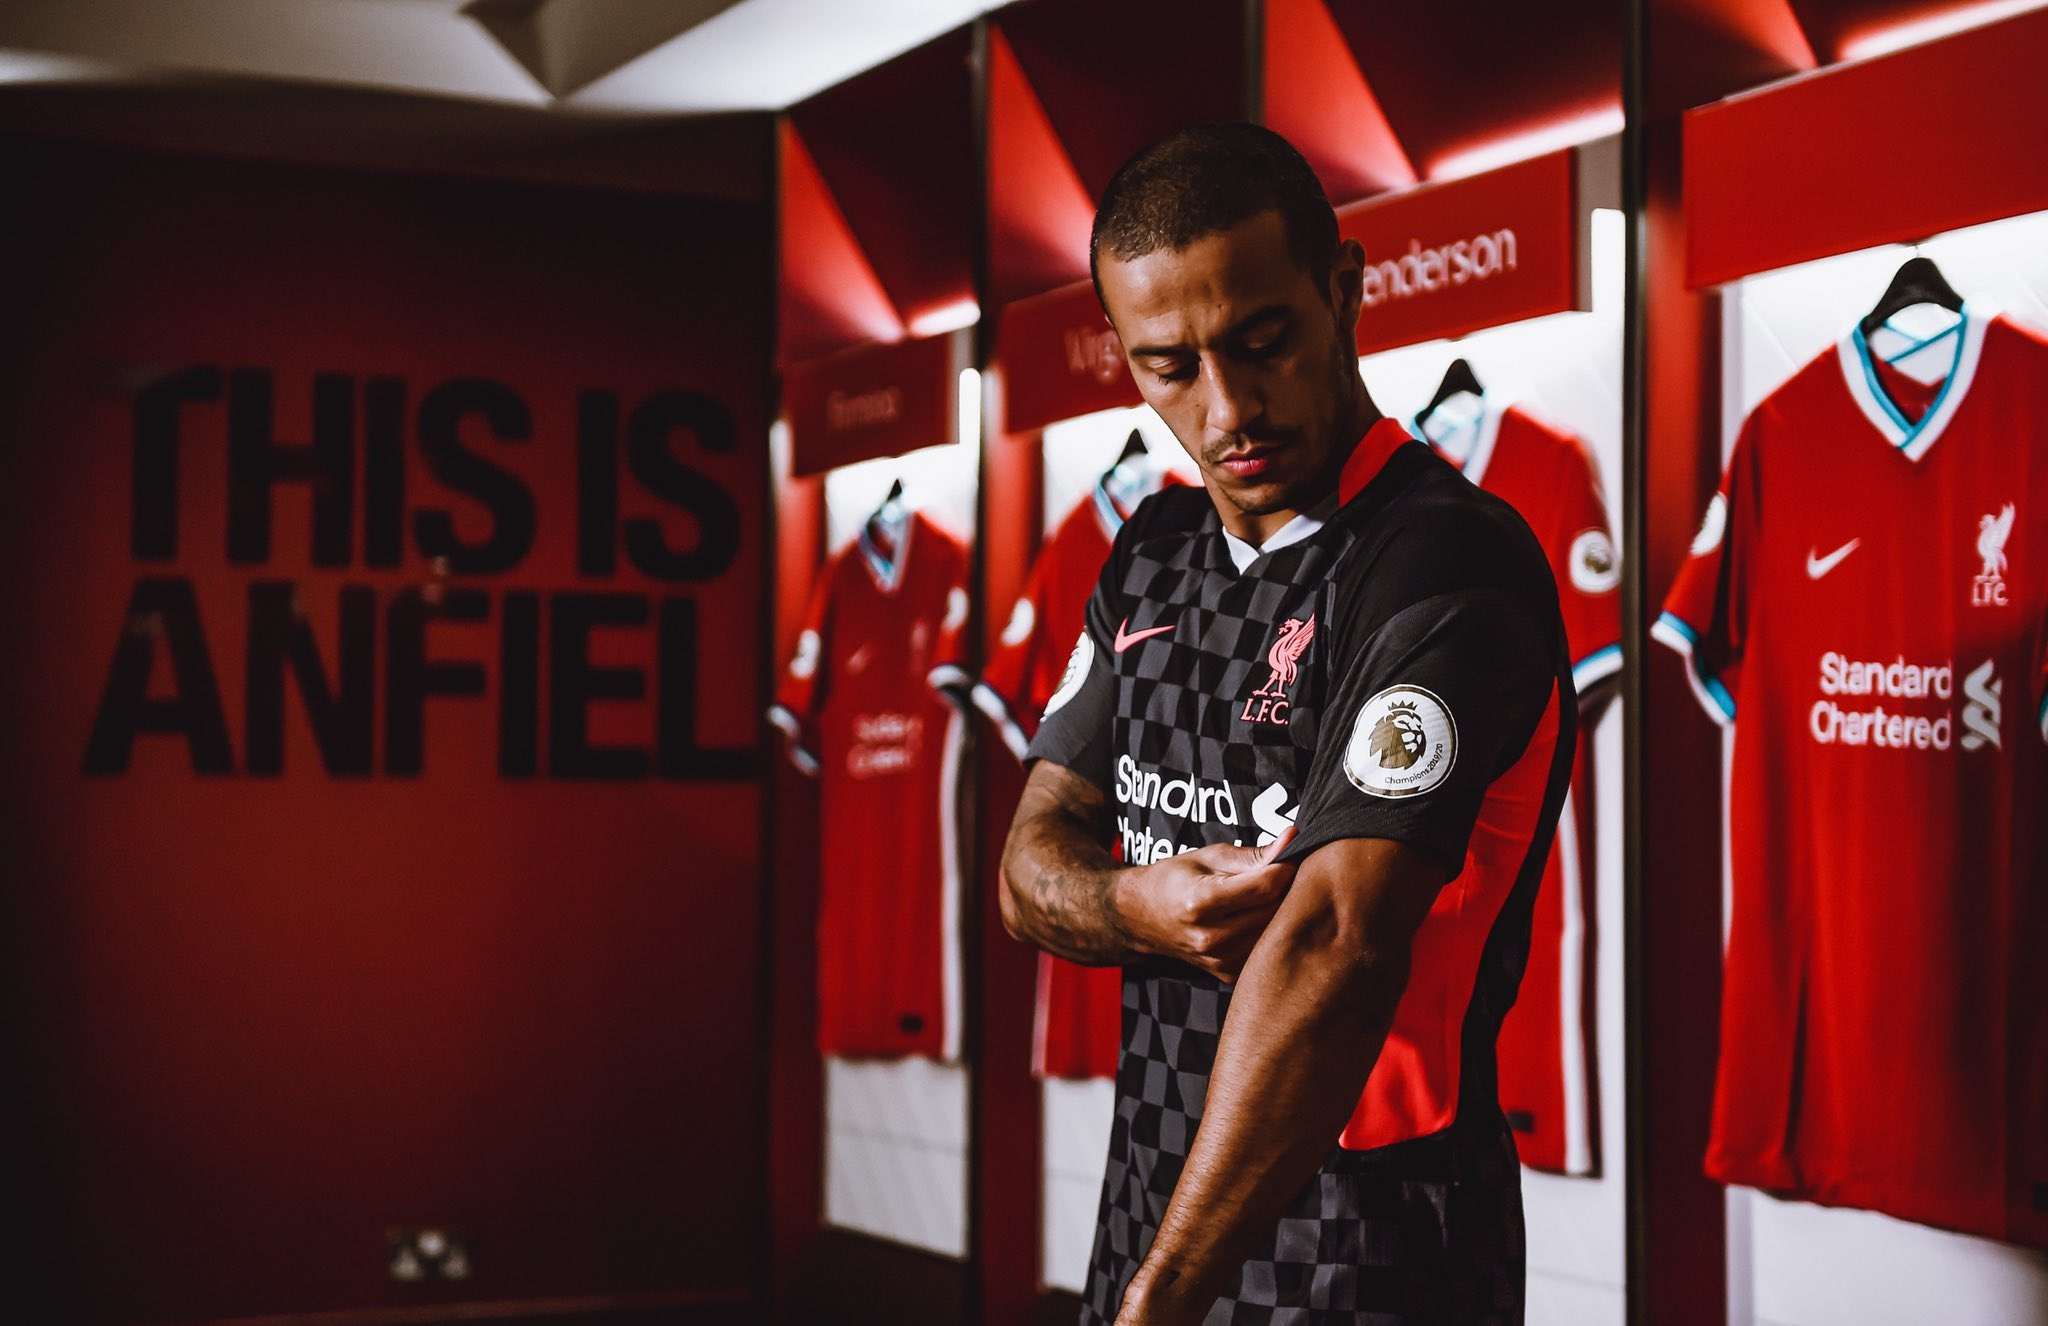 Thiago,  Liverpool,  Premier League,  Juergen Klopp,  Champions League,  Bayern,  Man United,  Chelsea,  Arsenal,  Barca anh 4